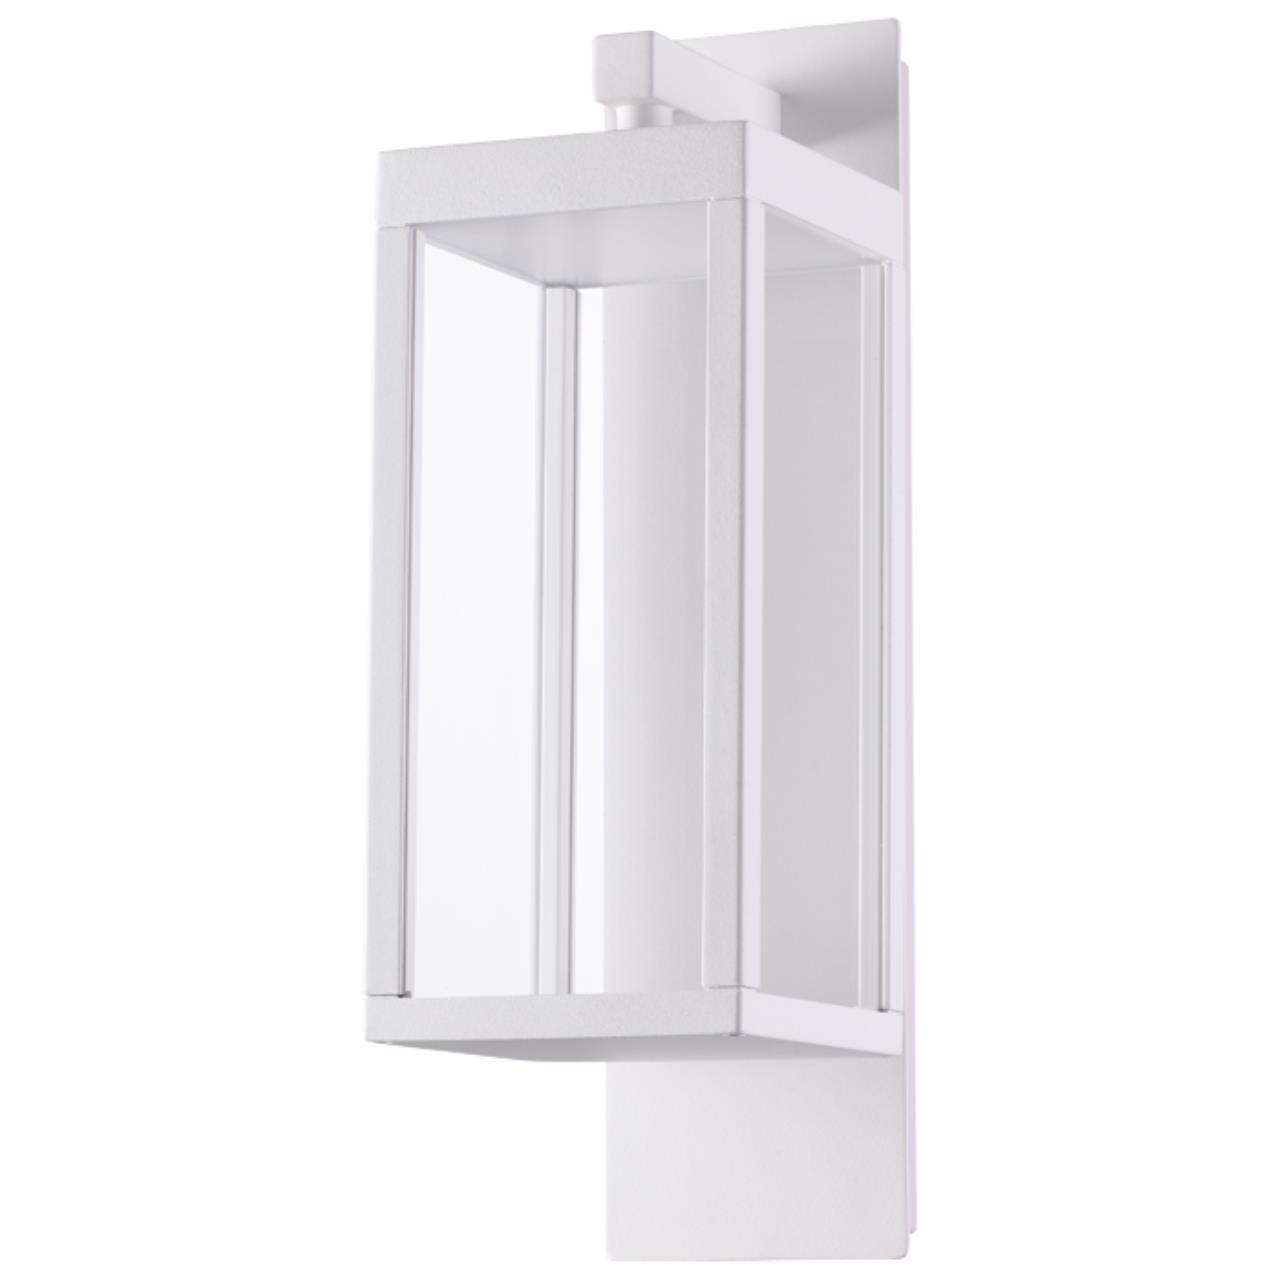 358119 STREET NT19 146 белый Ландшафтный настенный светильник IP54 LED 4100К 13W 100-240V IVORY LED